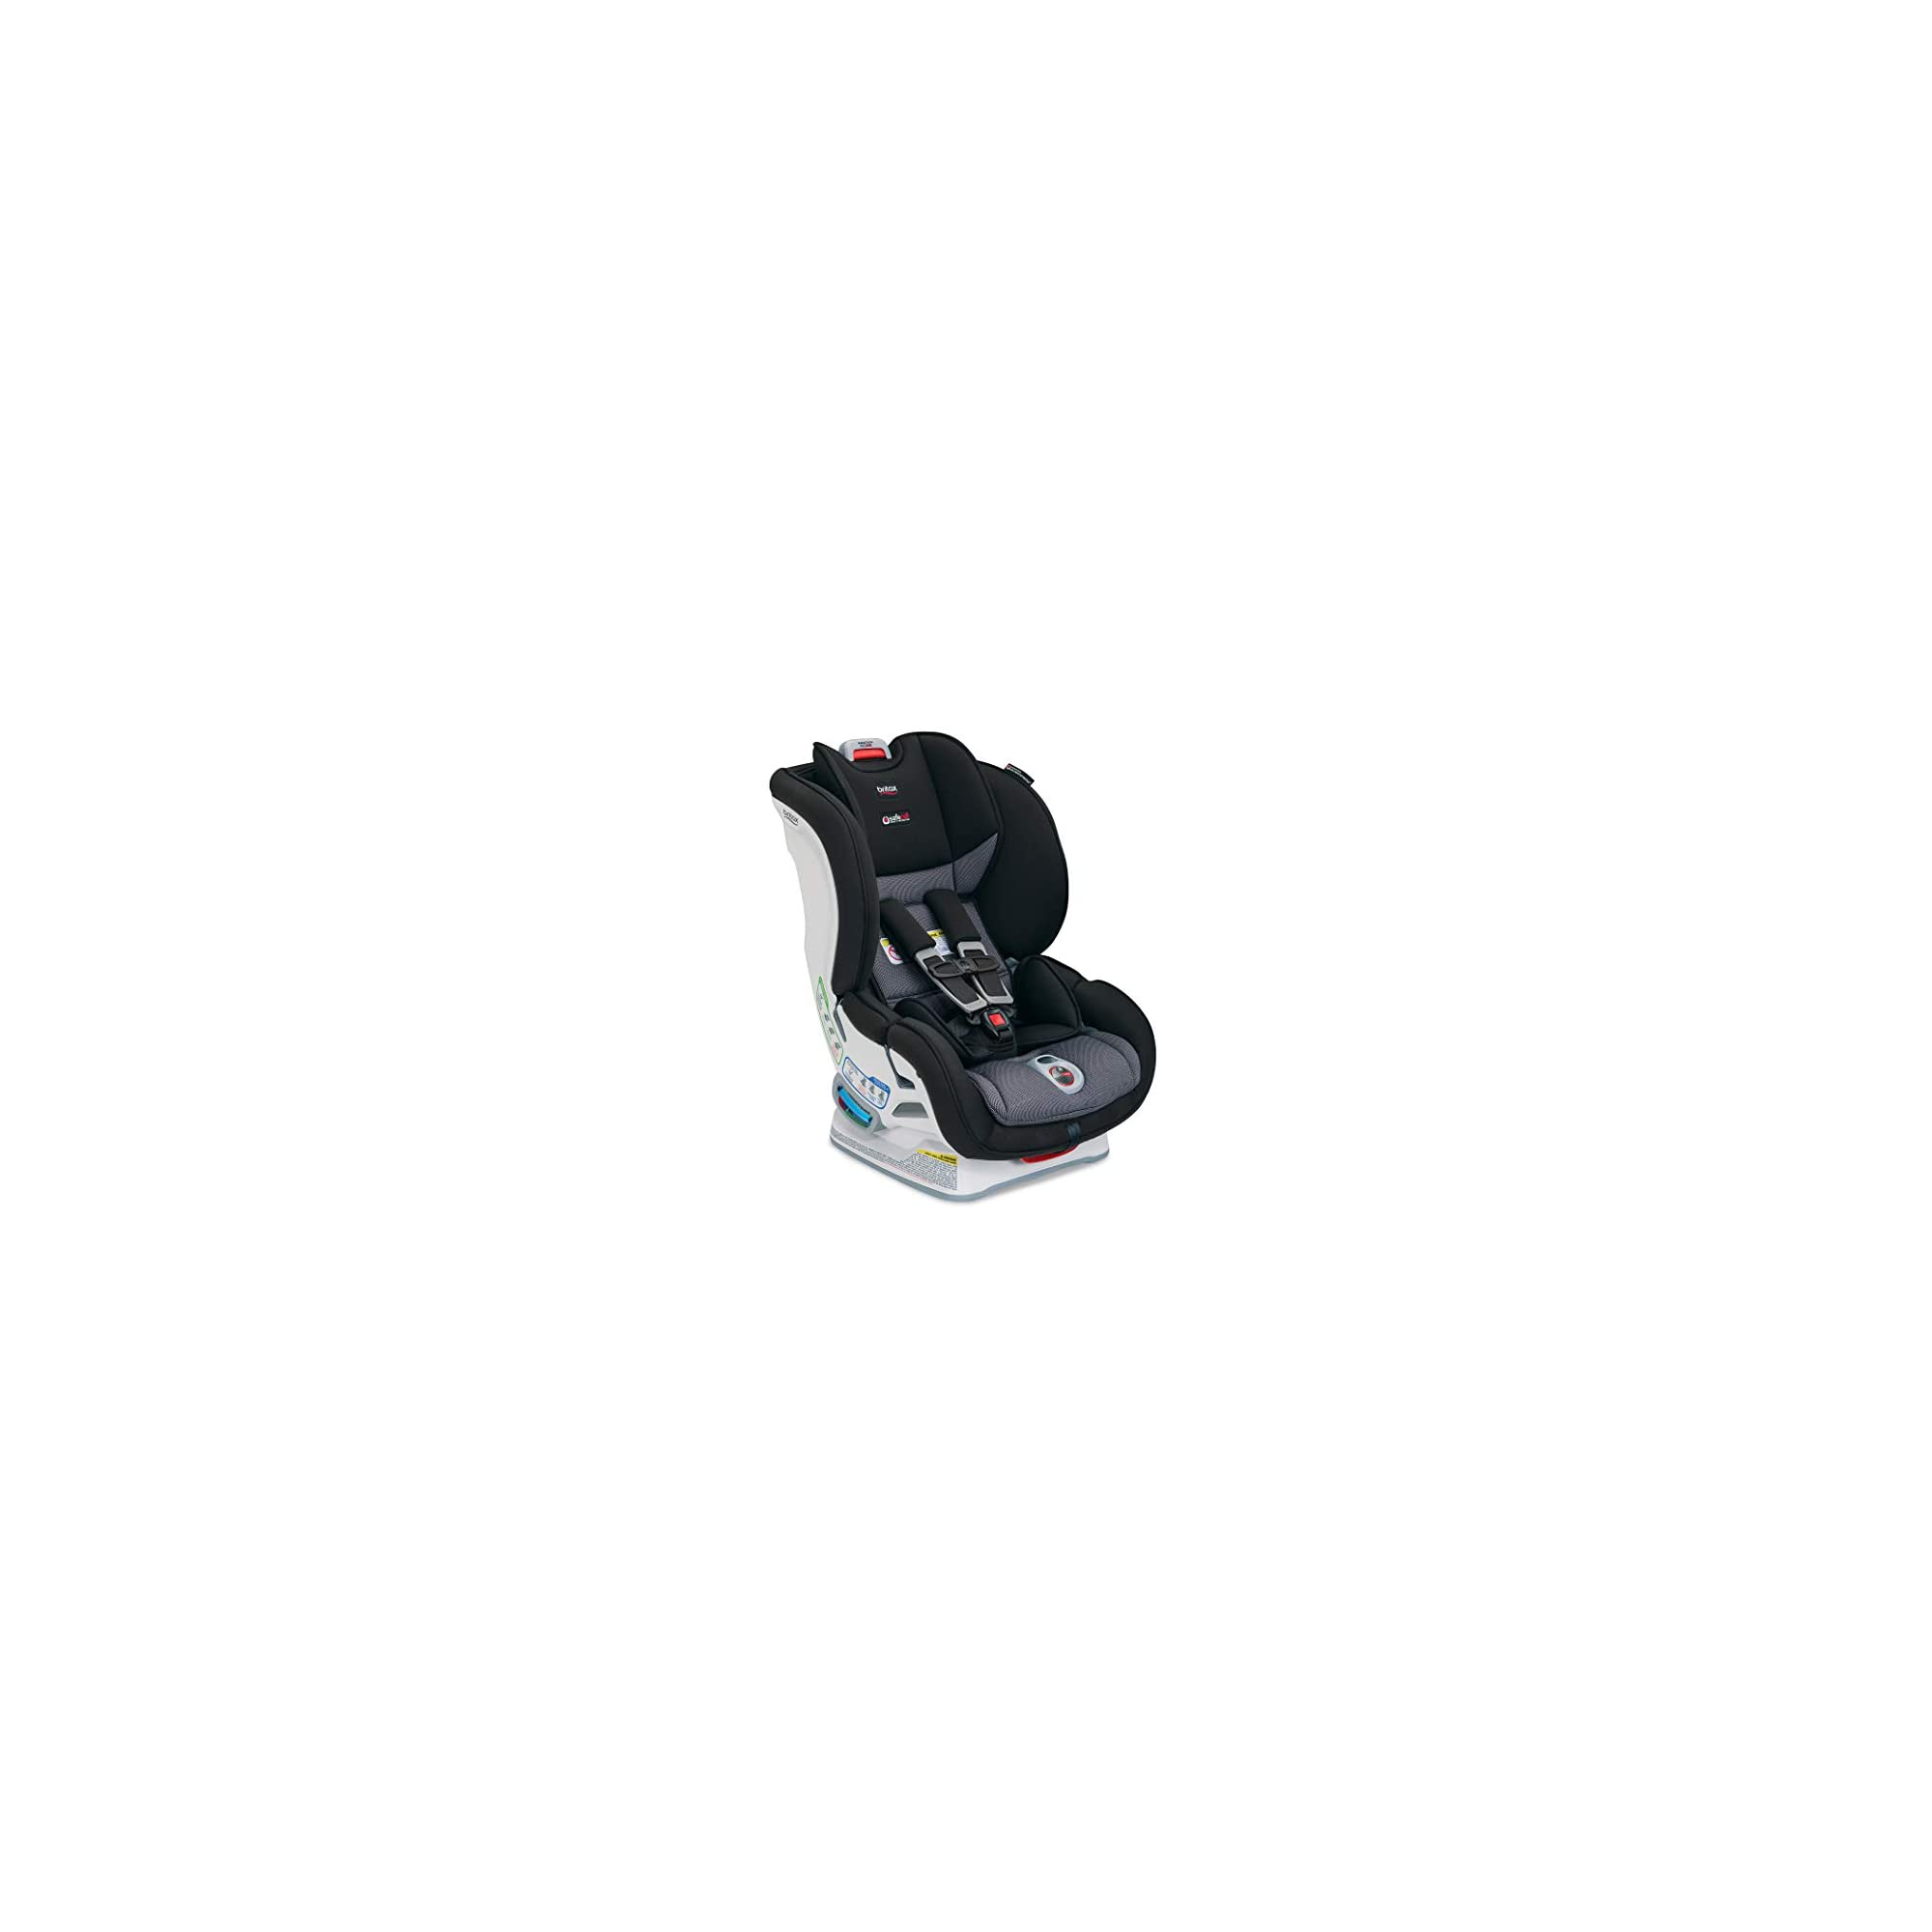 Britax Marathon ClickTight Convertible Car Seat | 1 Layer Impact Protection – Rear & Forward Facing – 5 to 65 Pounds, Verve